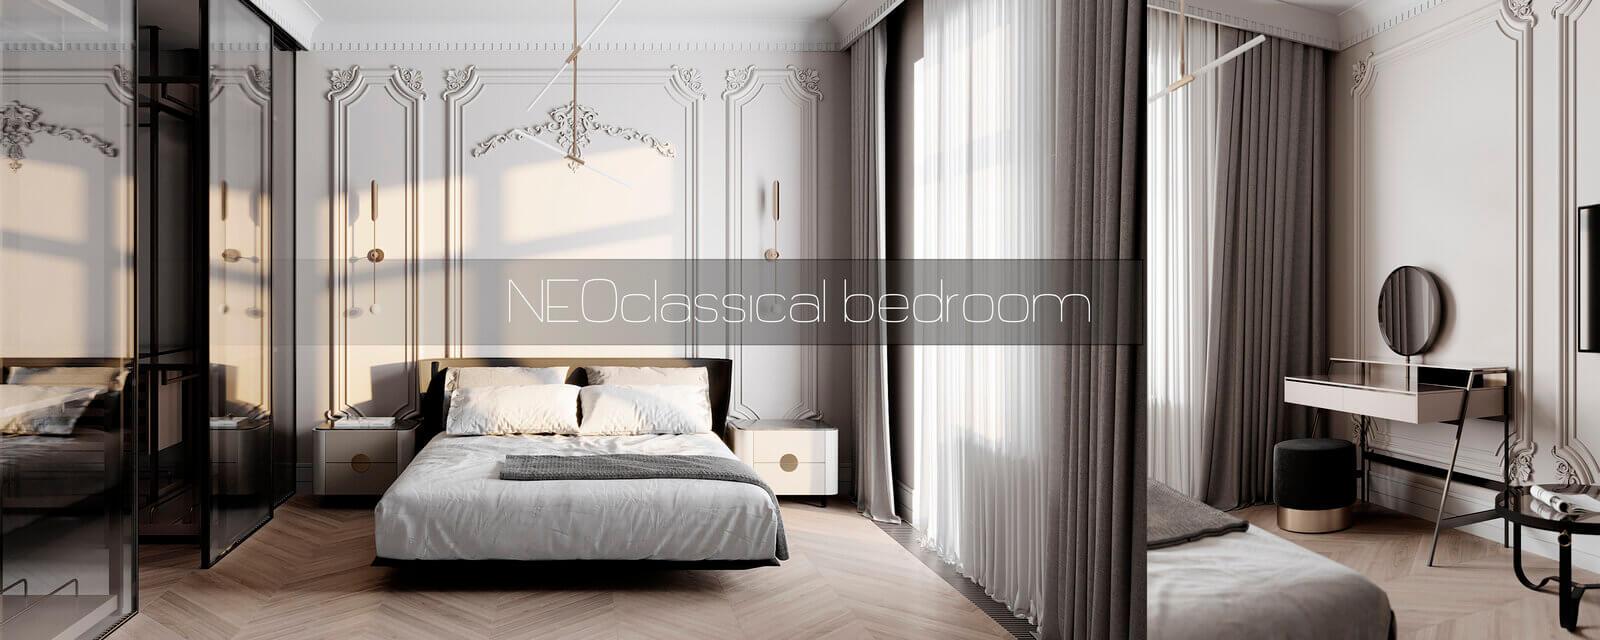 NEOclassical bedroom